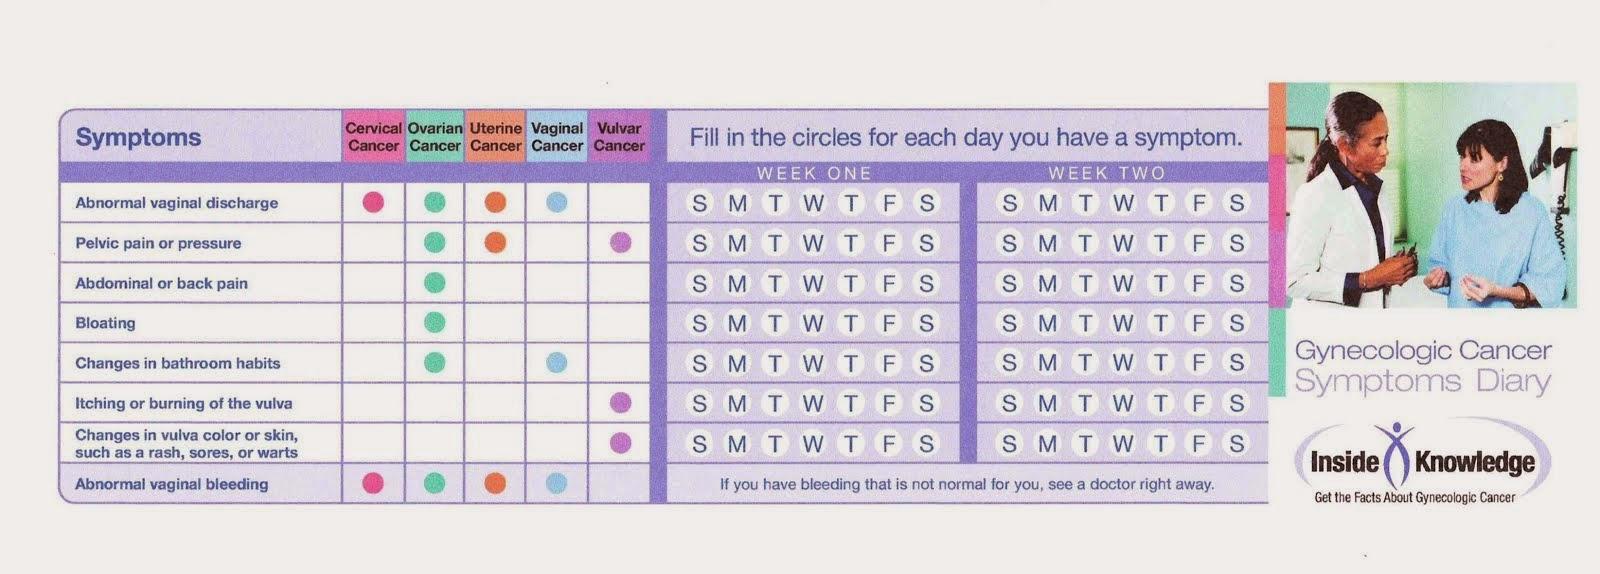 Symptom Diary Card